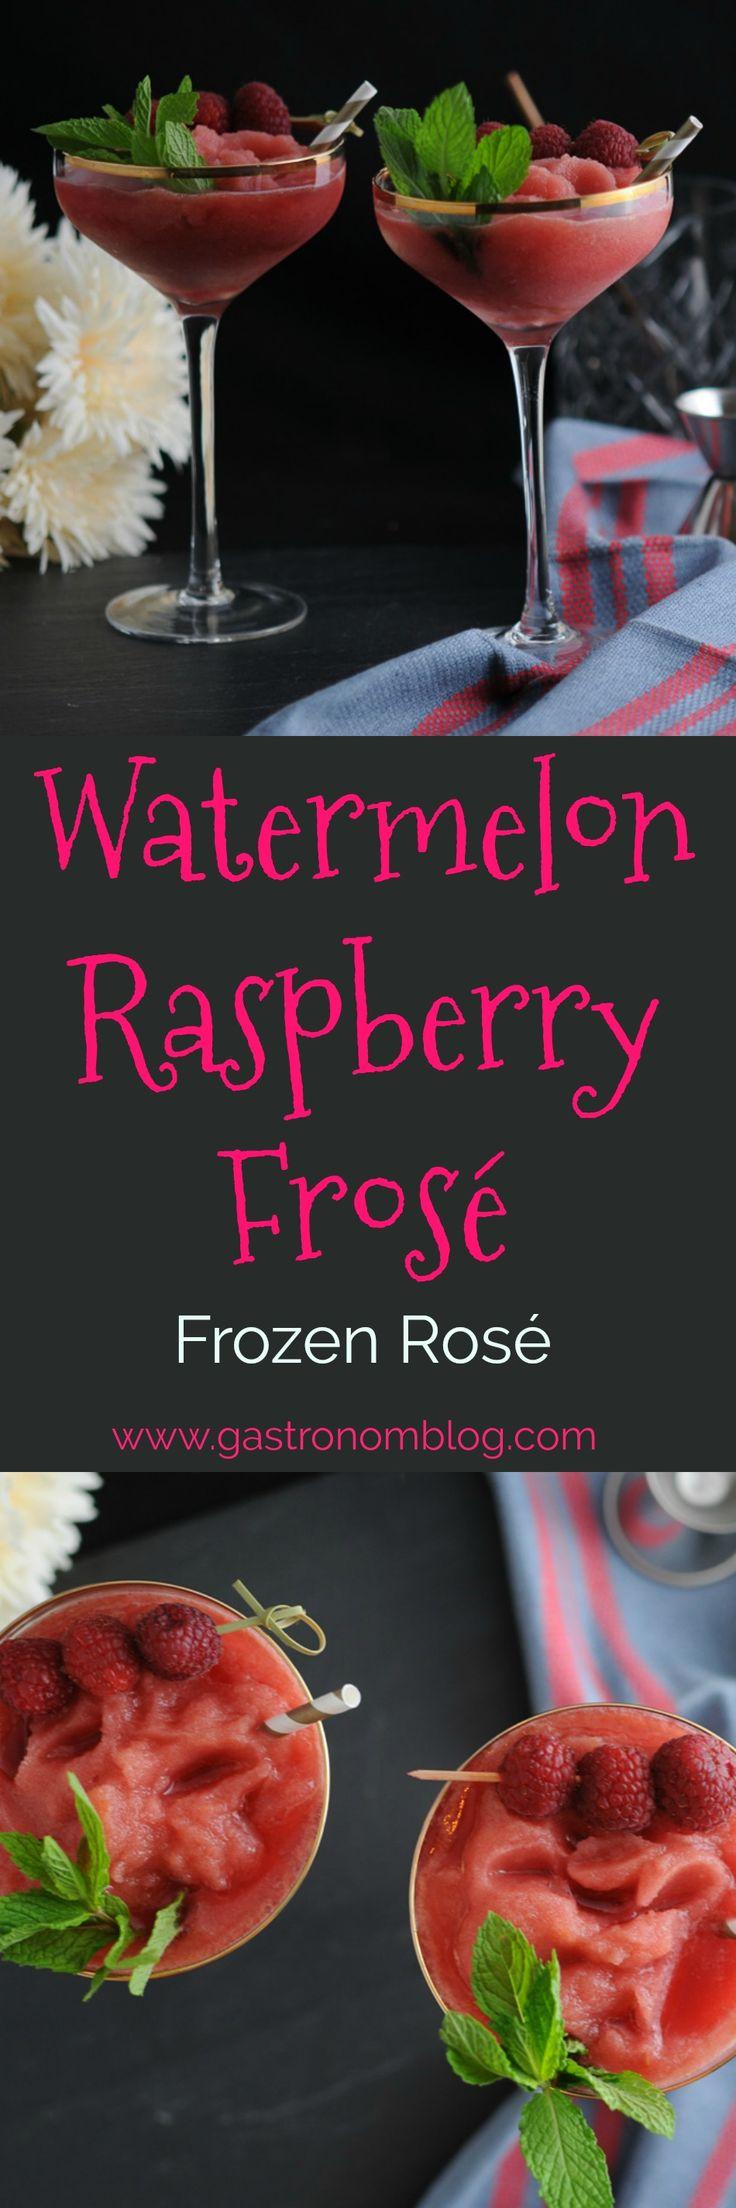 Watermelon Raspberry Frosé, Frozen Rosé.   Sparkling Rose, Rose champagne, frozen watermelon, frozen raspberries, lemon juice, cocktails, craft cocktails, cocktails, recipe, easy, summer, summer cocktails, drinks to cool off with, recipes